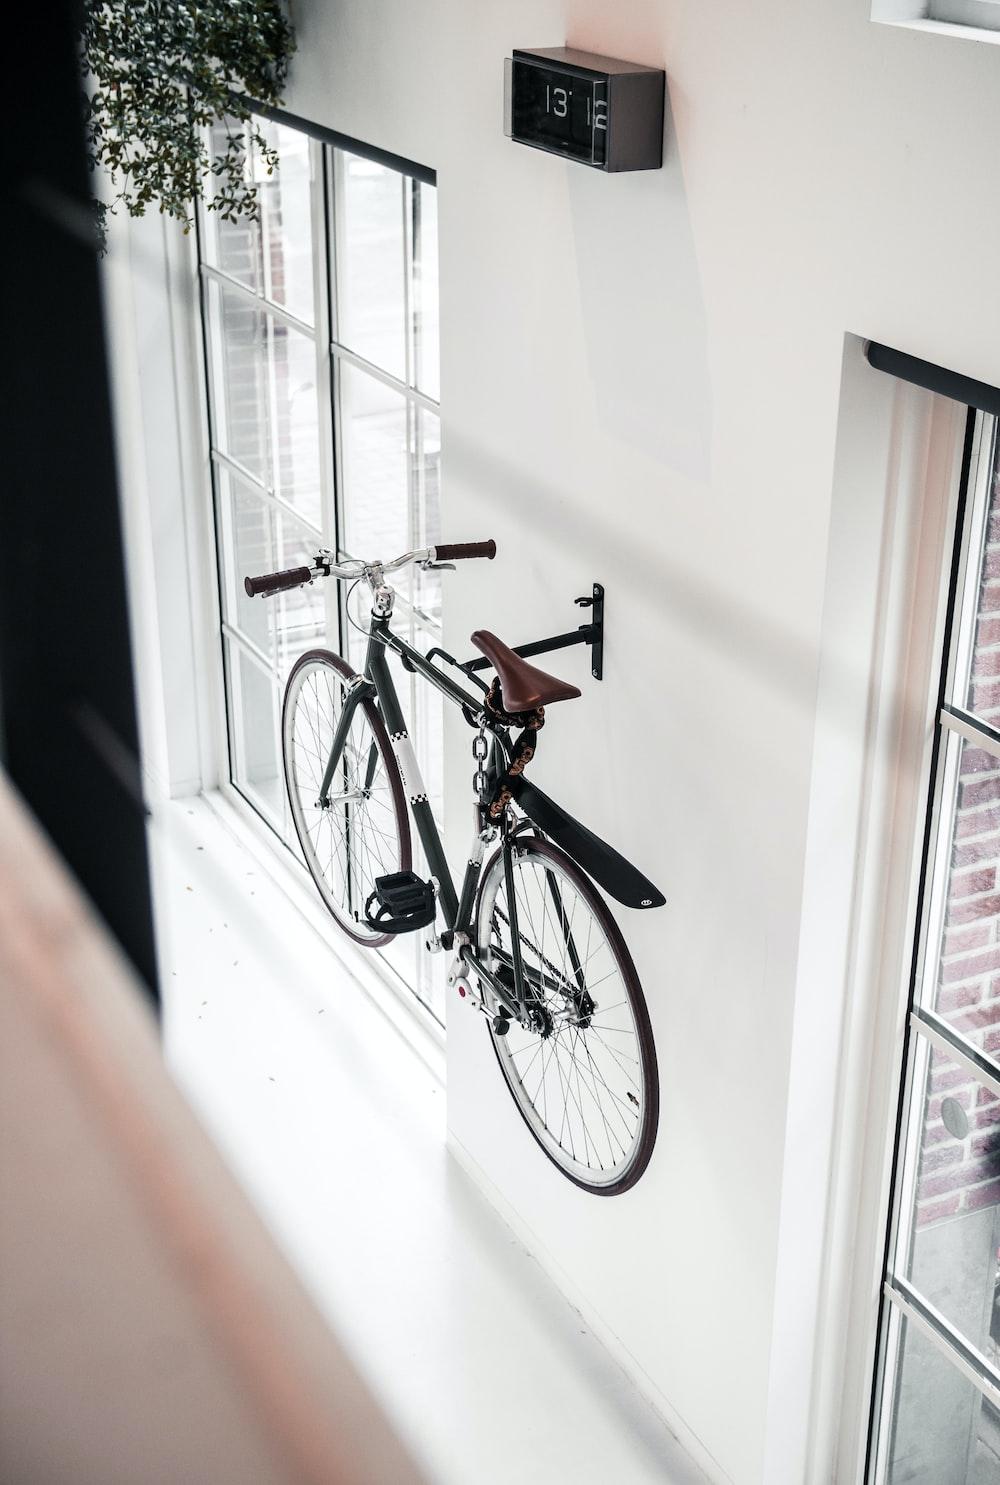 black mountain bicycle mounted on wall